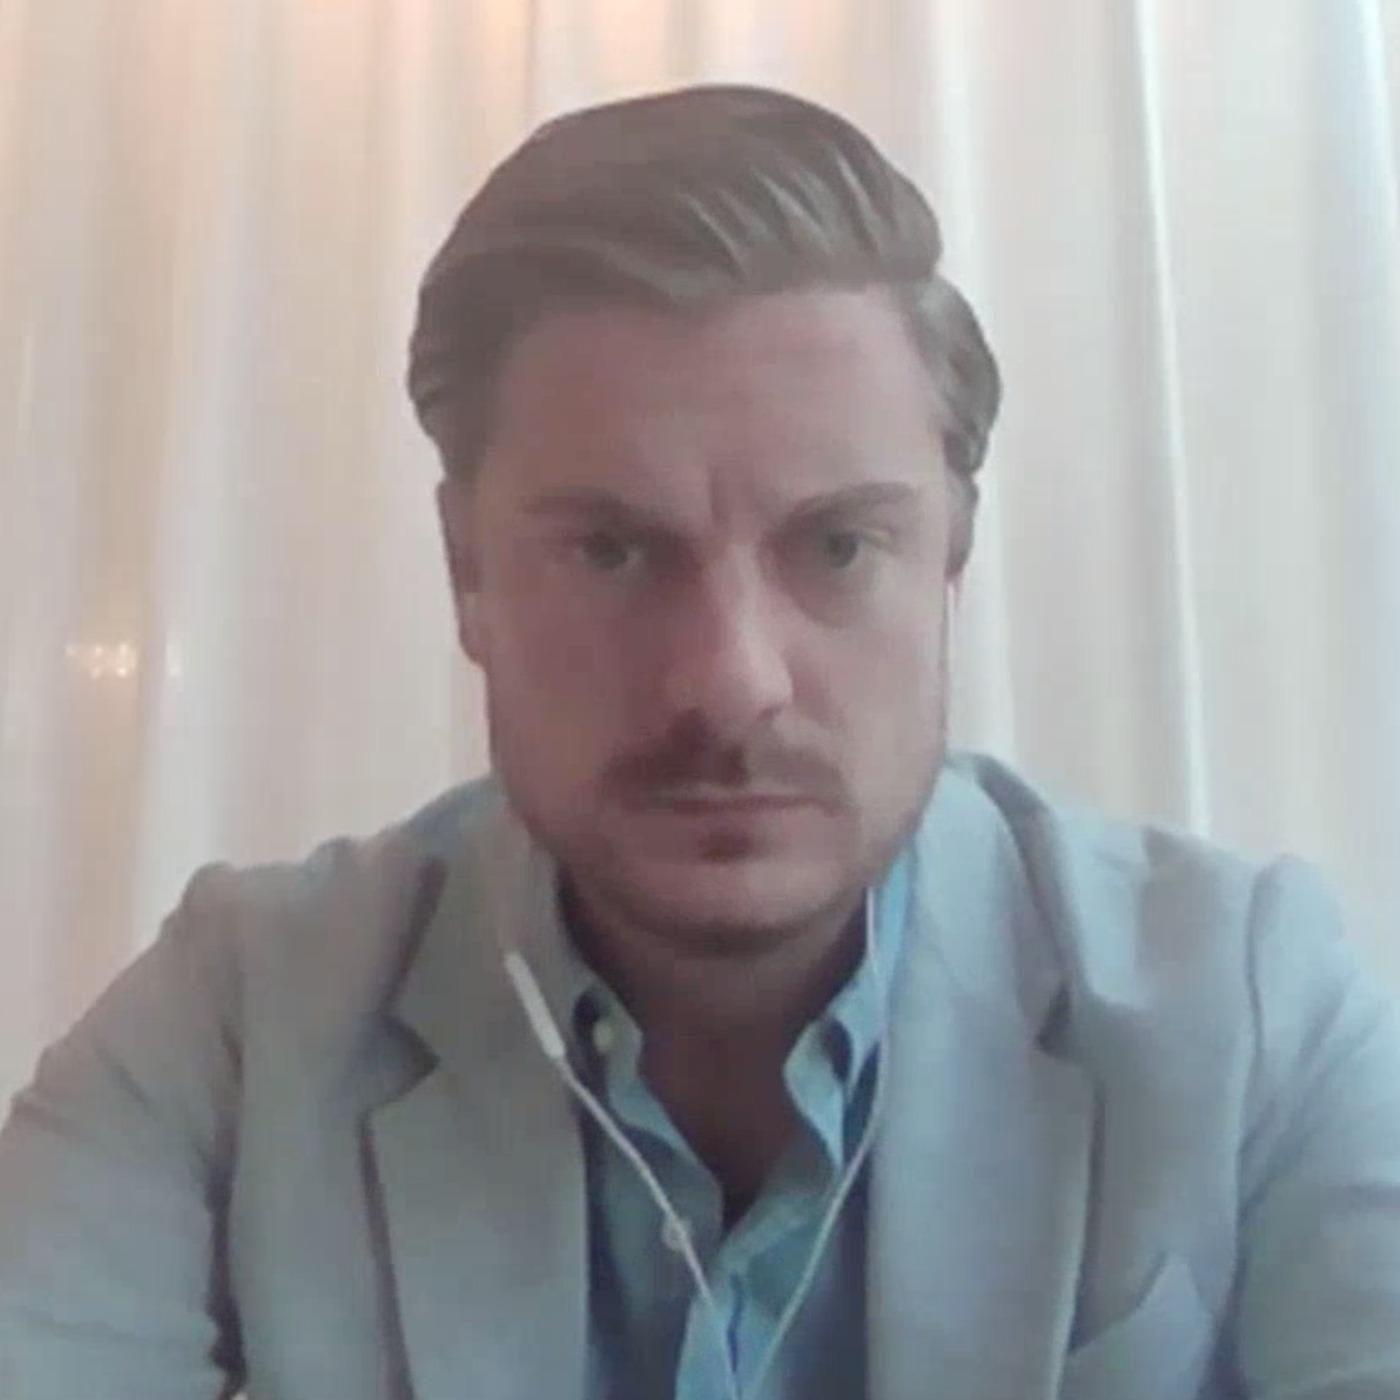 Niklas Pålsson